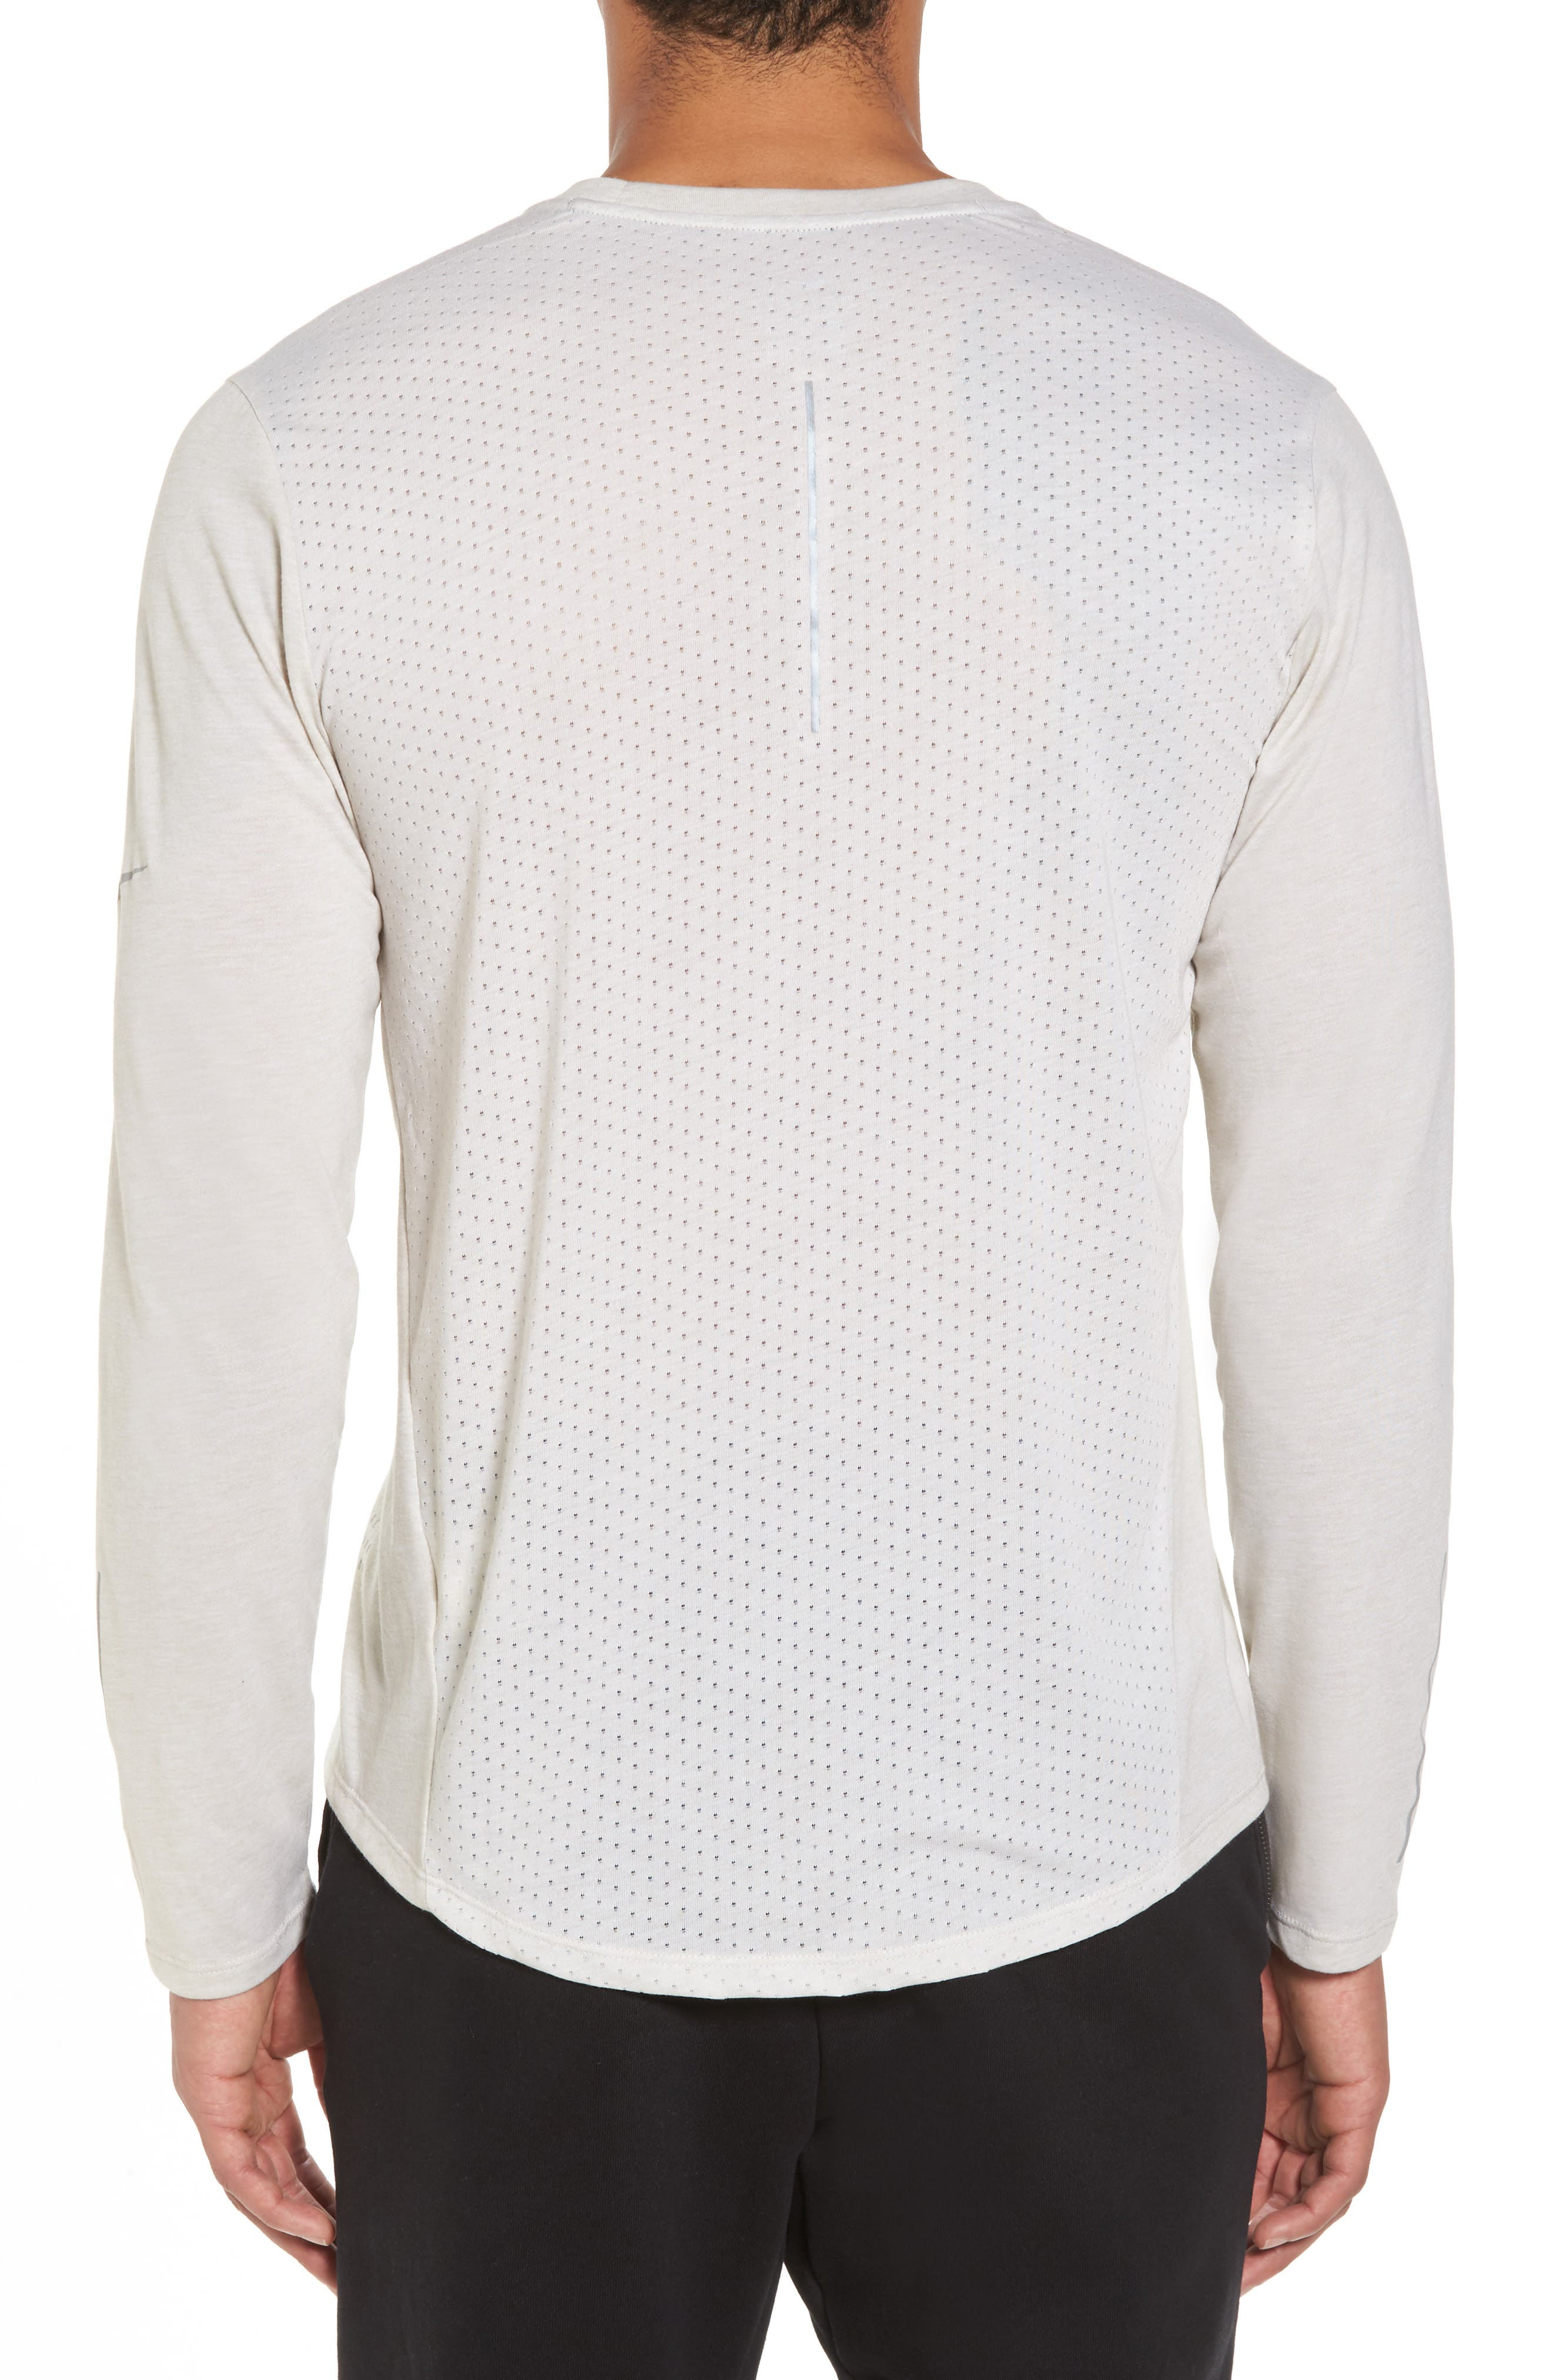 Tailwind Long Sleeve Running T-Shirt,                             Alternate thumbnail 2, color,                             Light Bone/ Heather